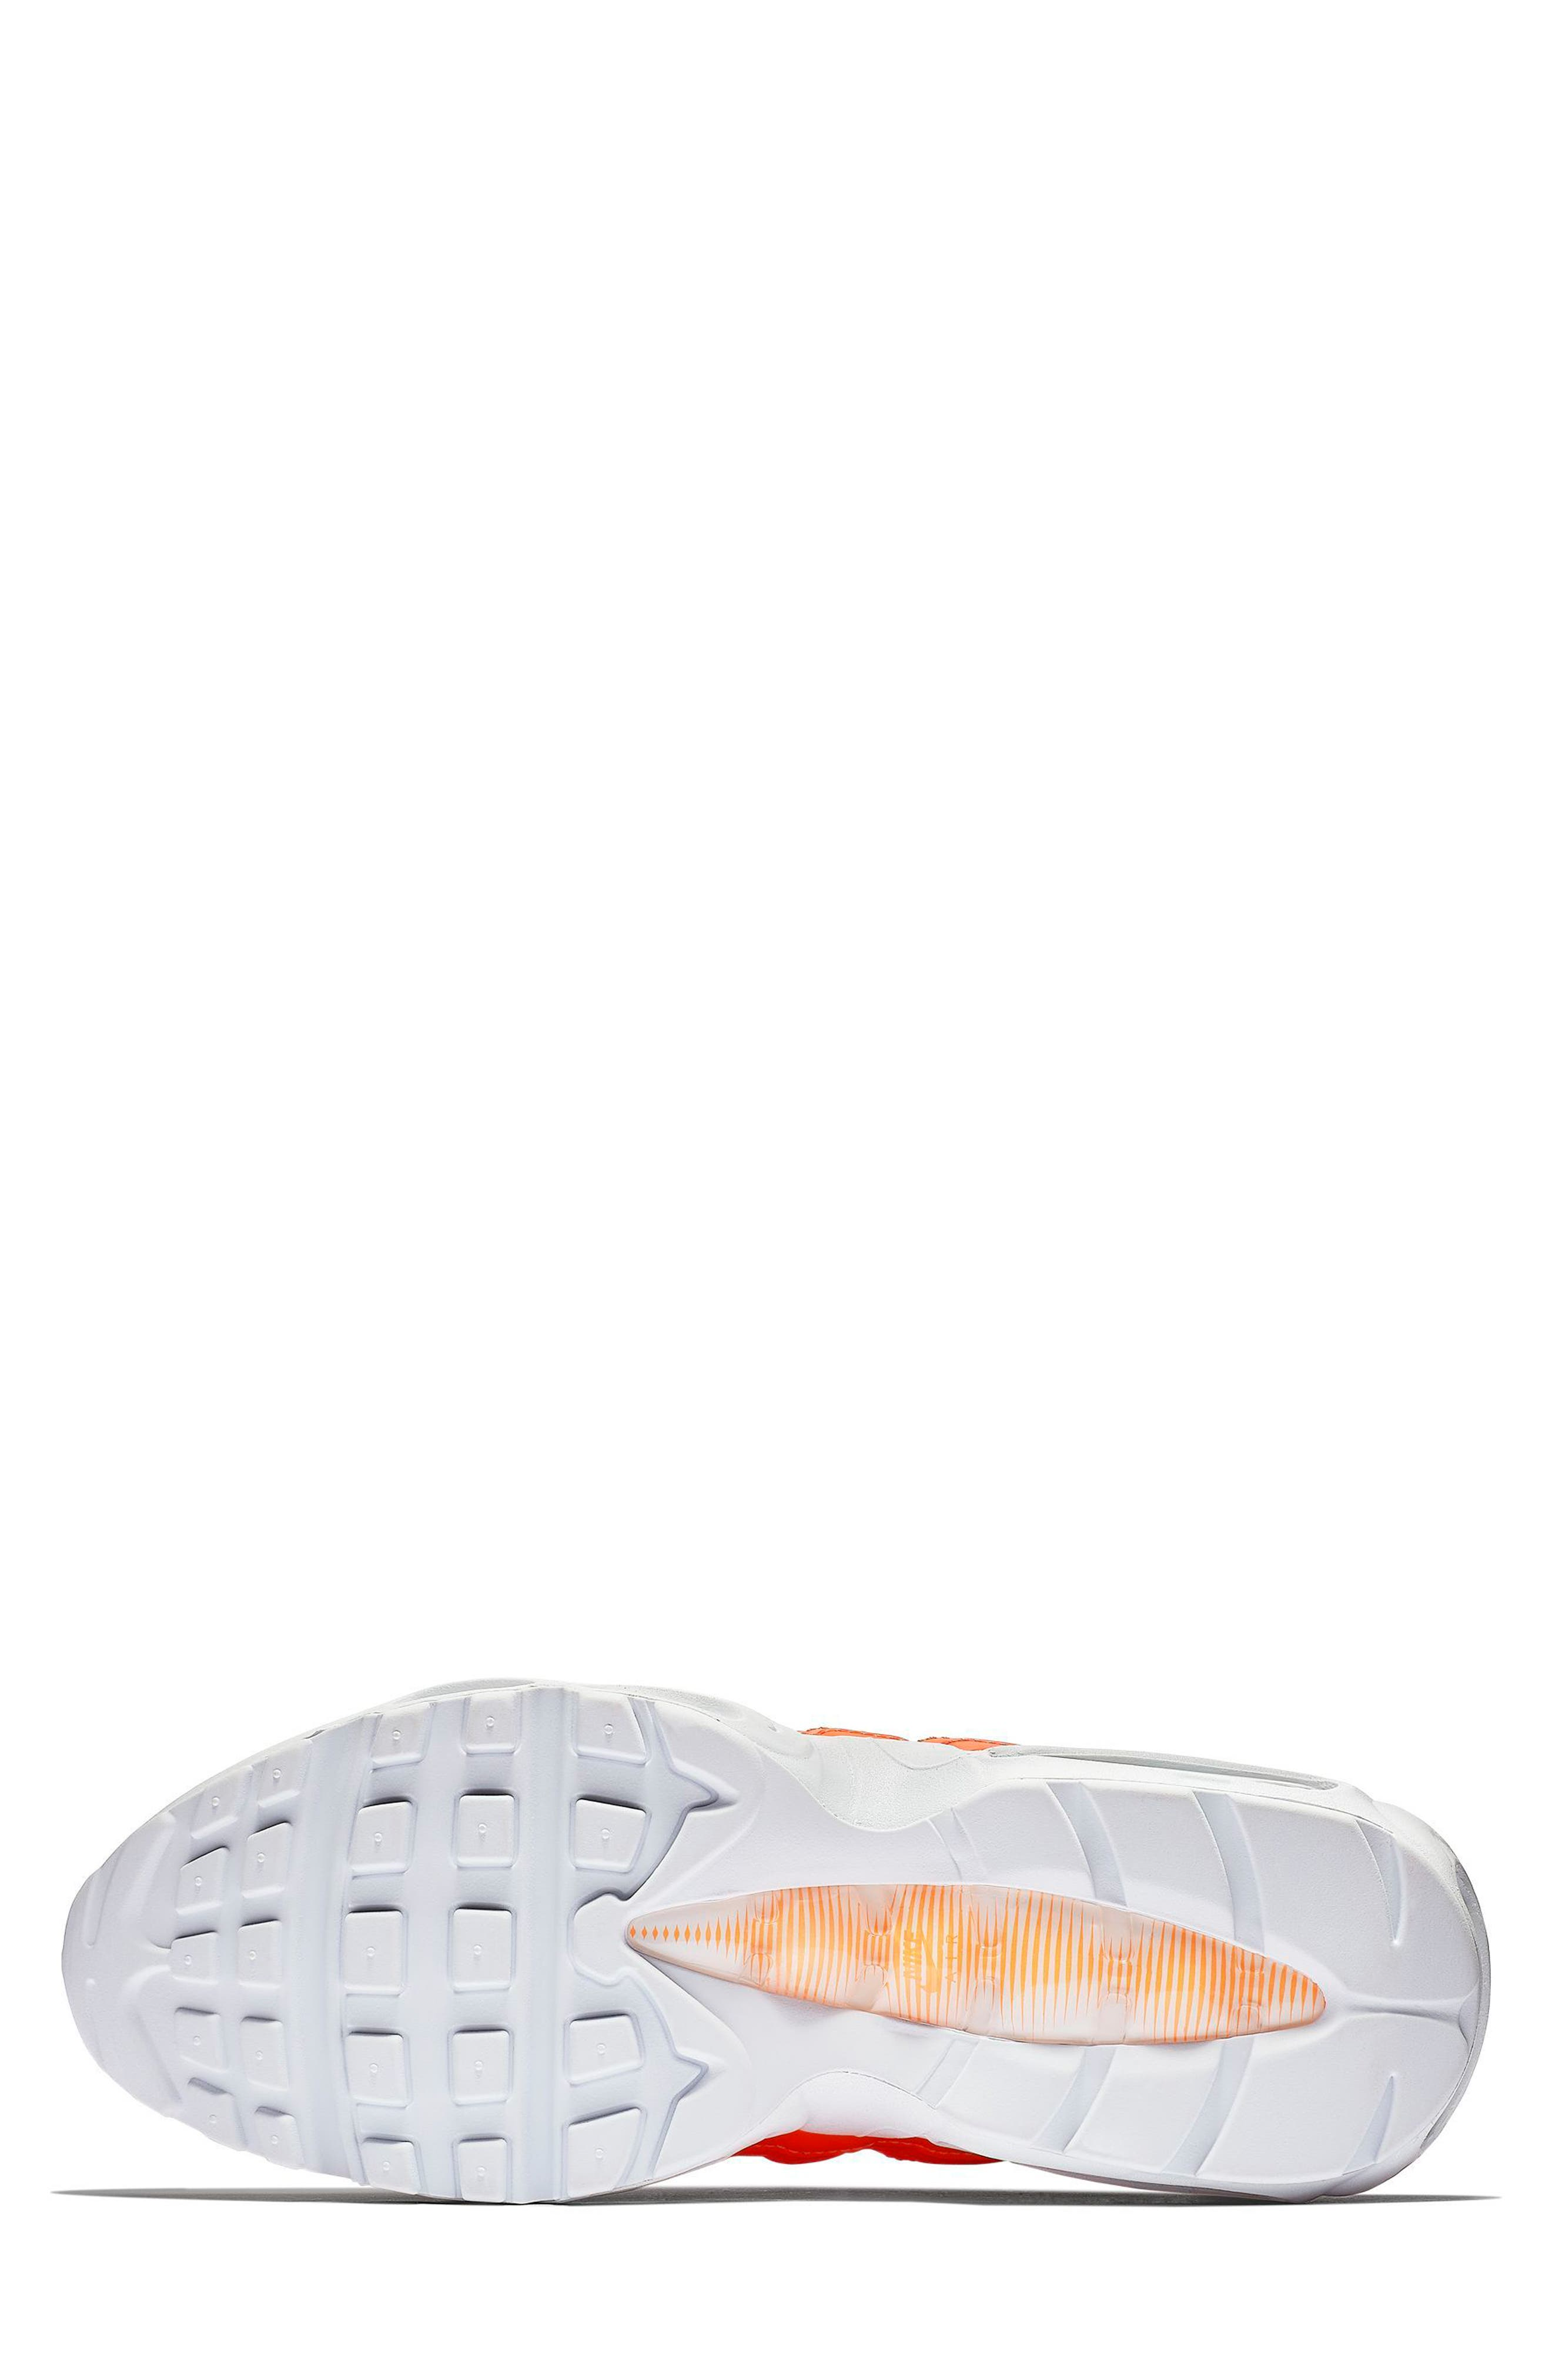 NIKE,                             Air Max 95 SE Running Shoe,                             Alternate thumbnail 5, color,                             800